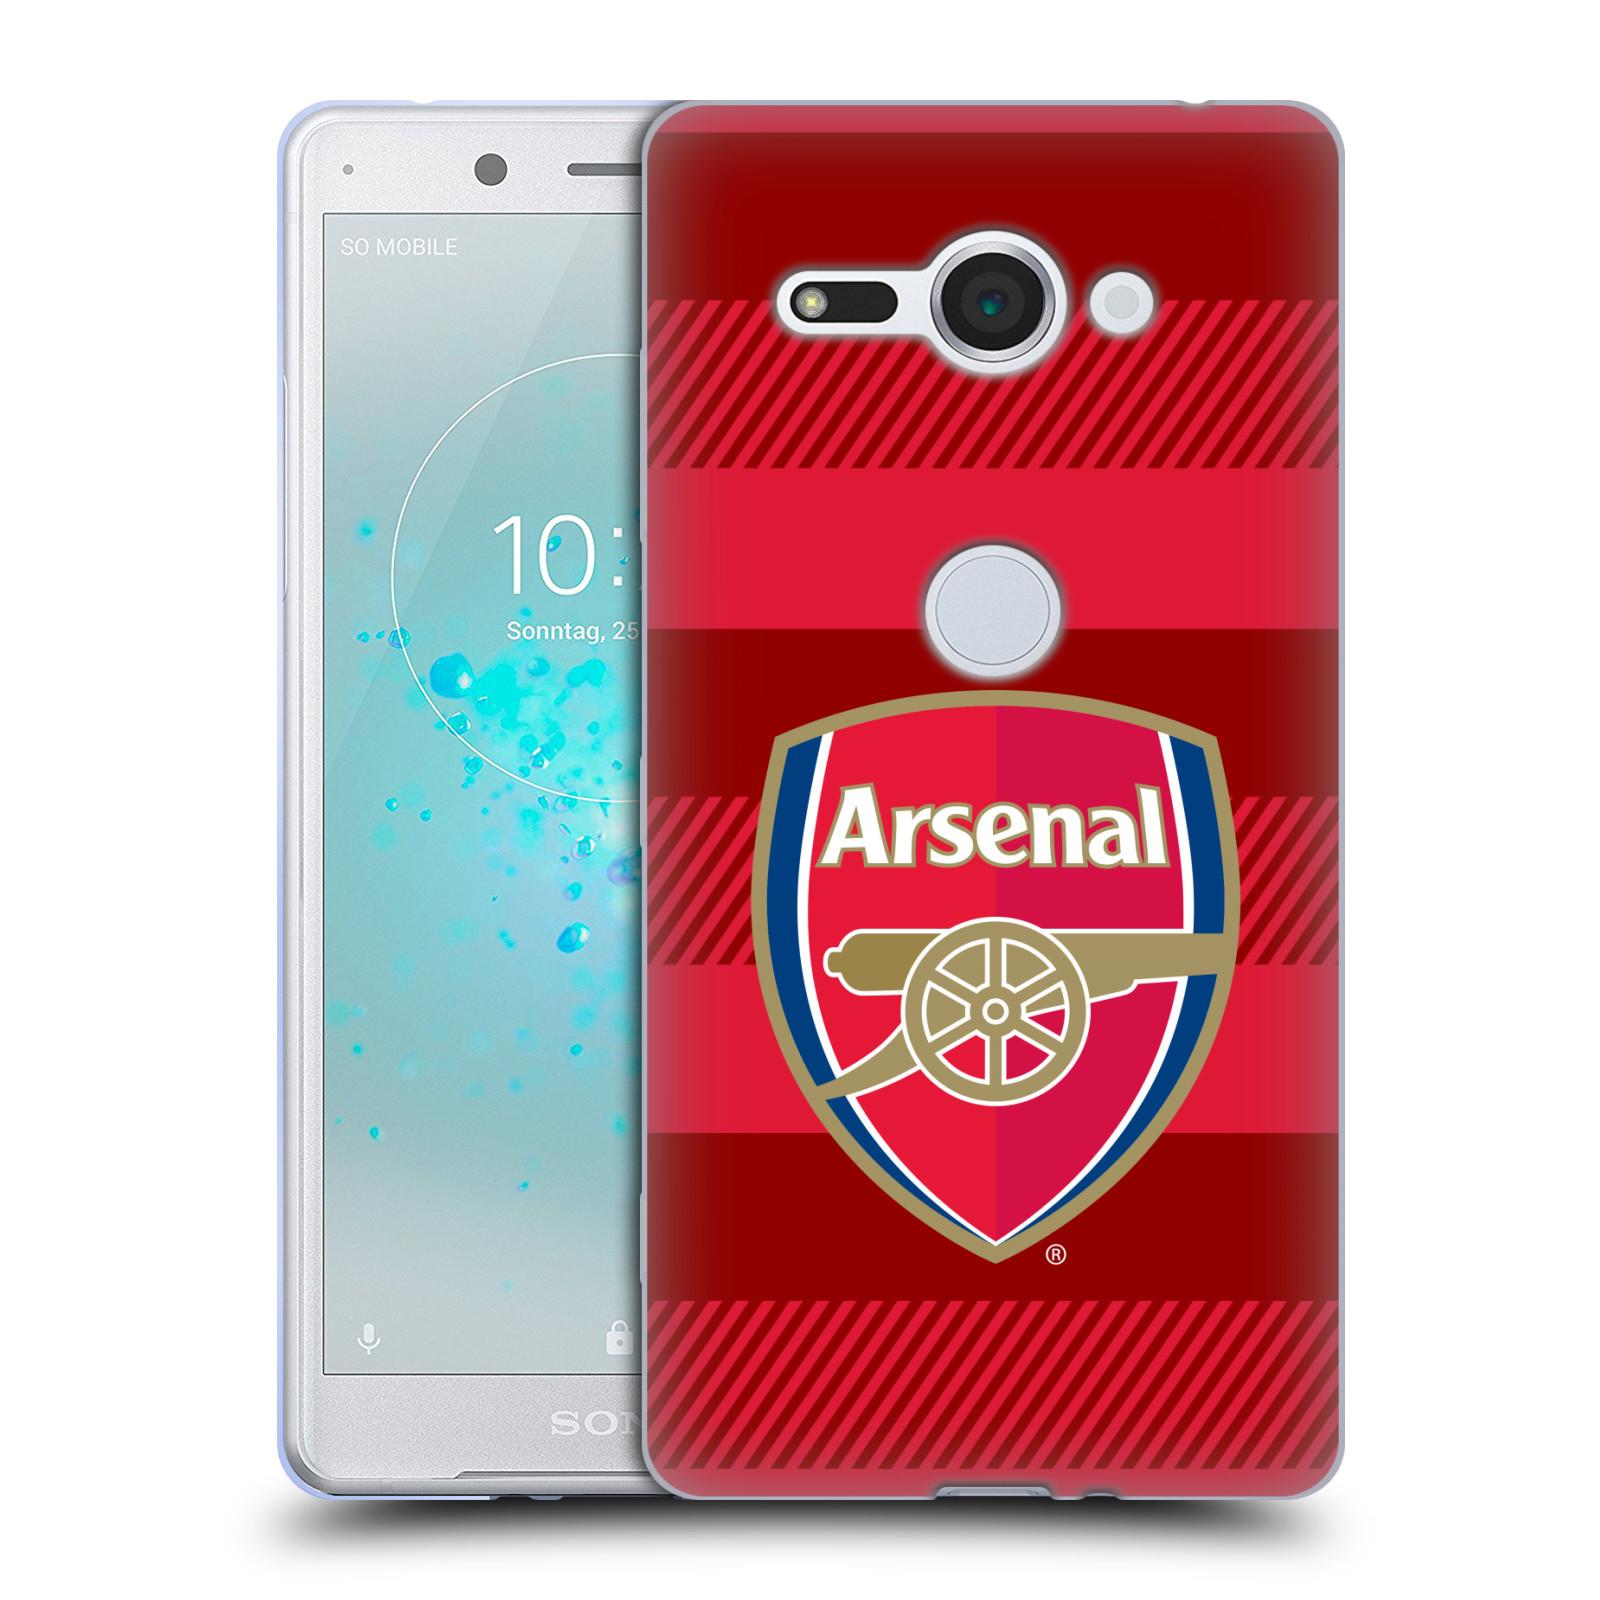 Silikonové pouzdro na mobil Sony Xperia XZ2 Compact - Head Case - Arsenal FC - Logo s pruhy